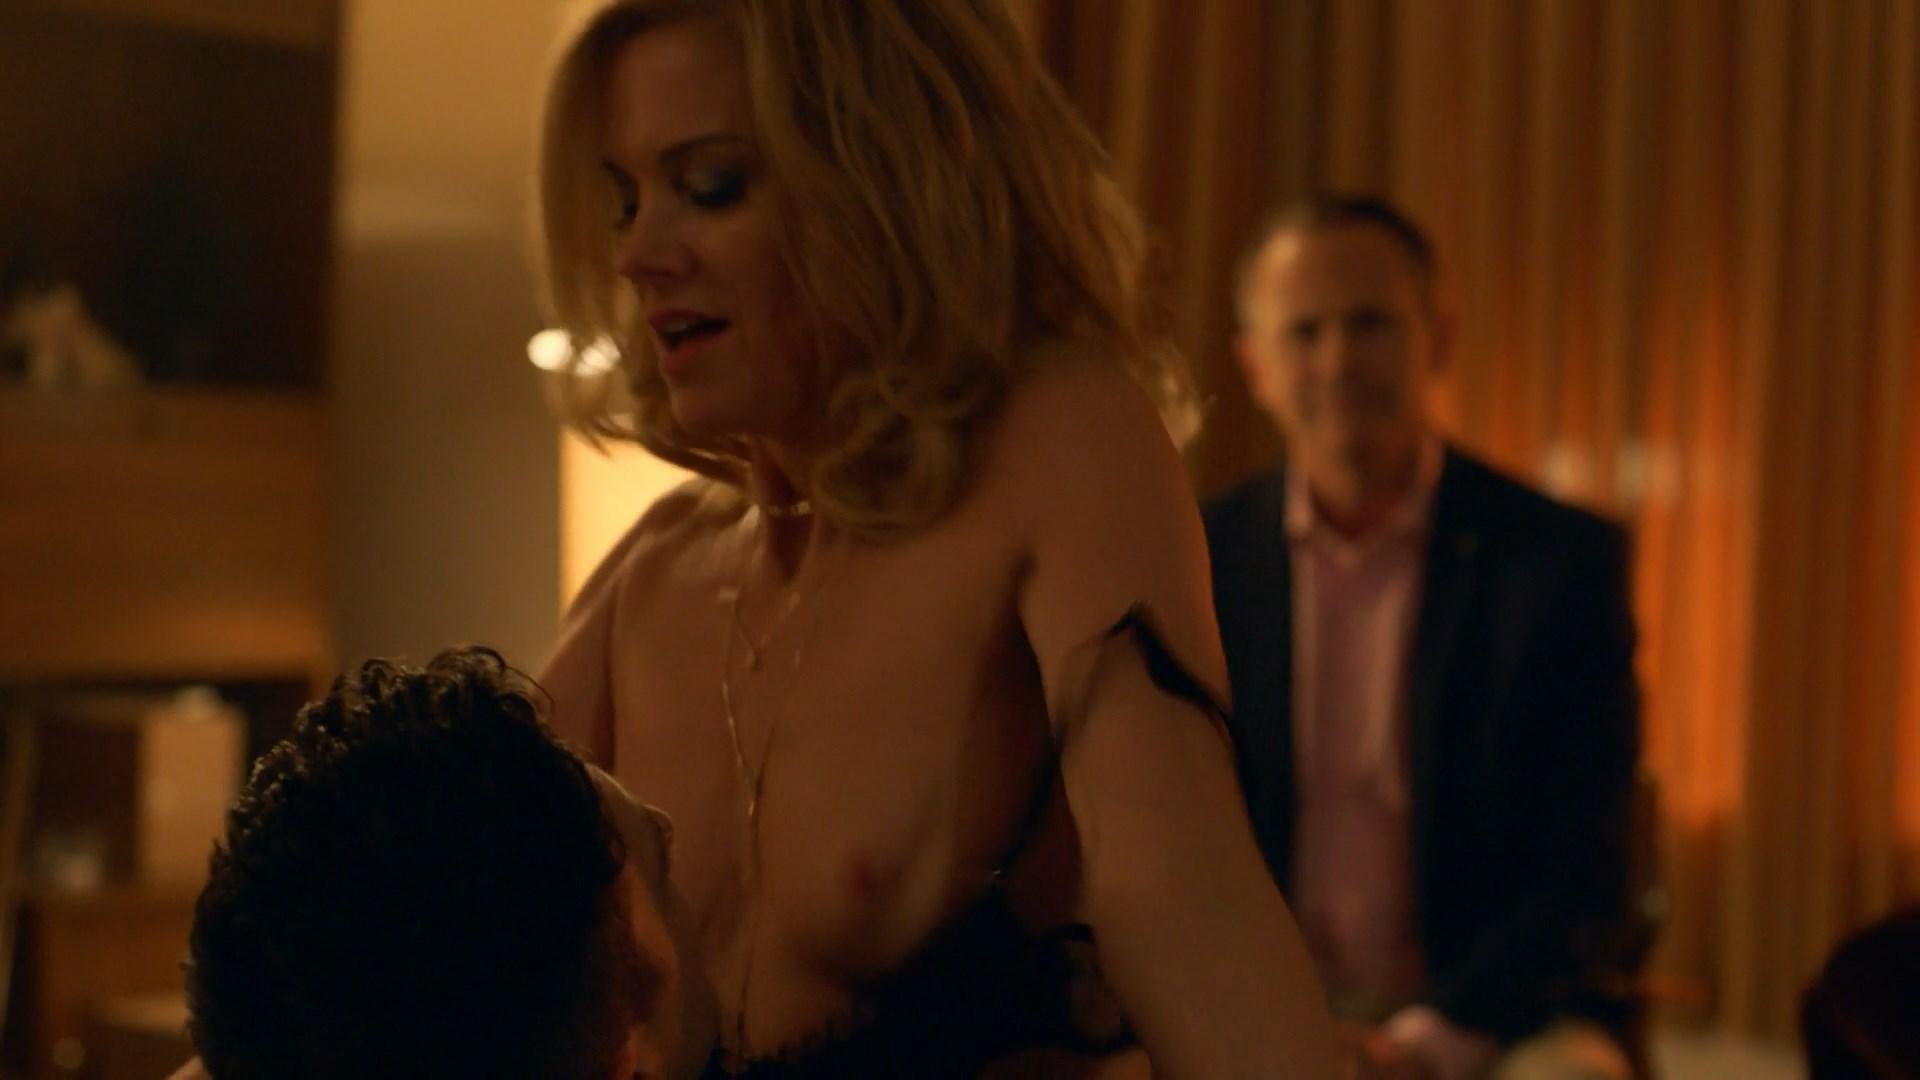 alice in wonderland threesome porn